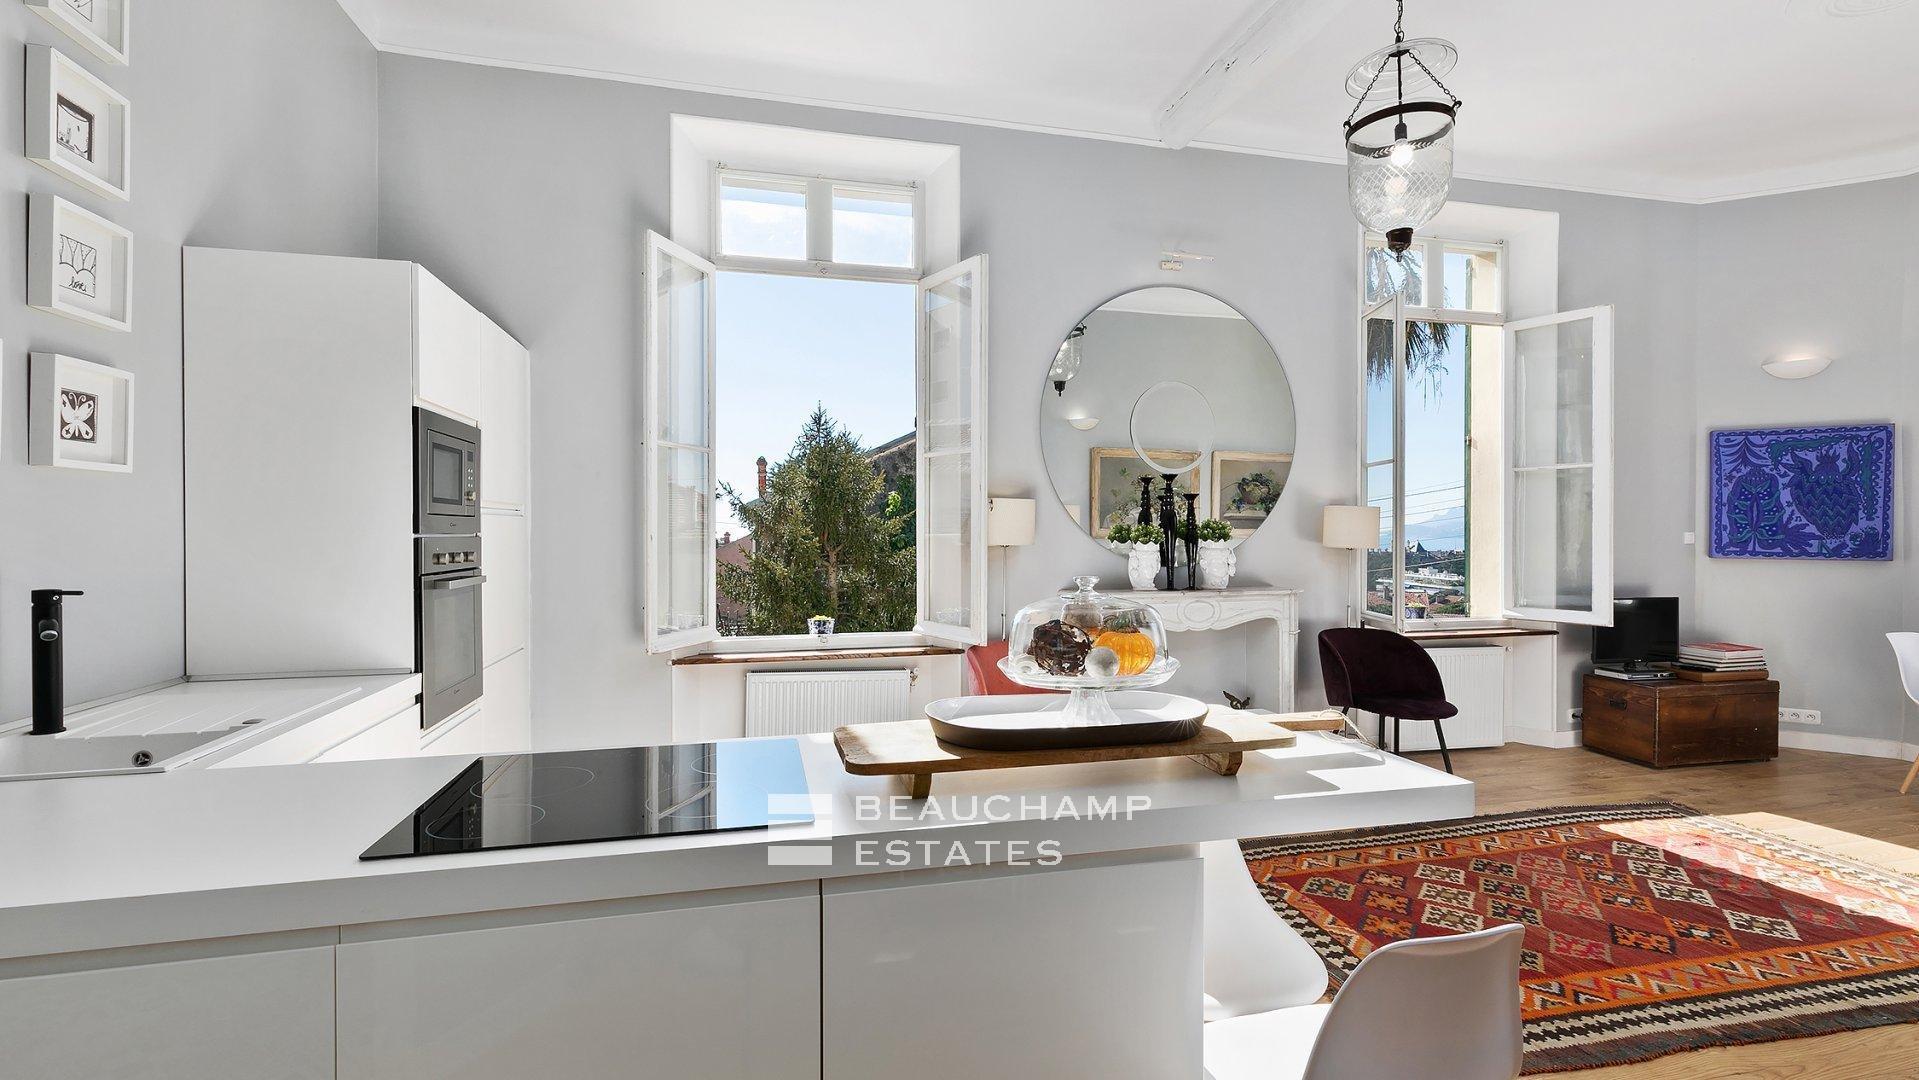 Superbe Maison de Villa de 5 Chambres, Proche Croisette